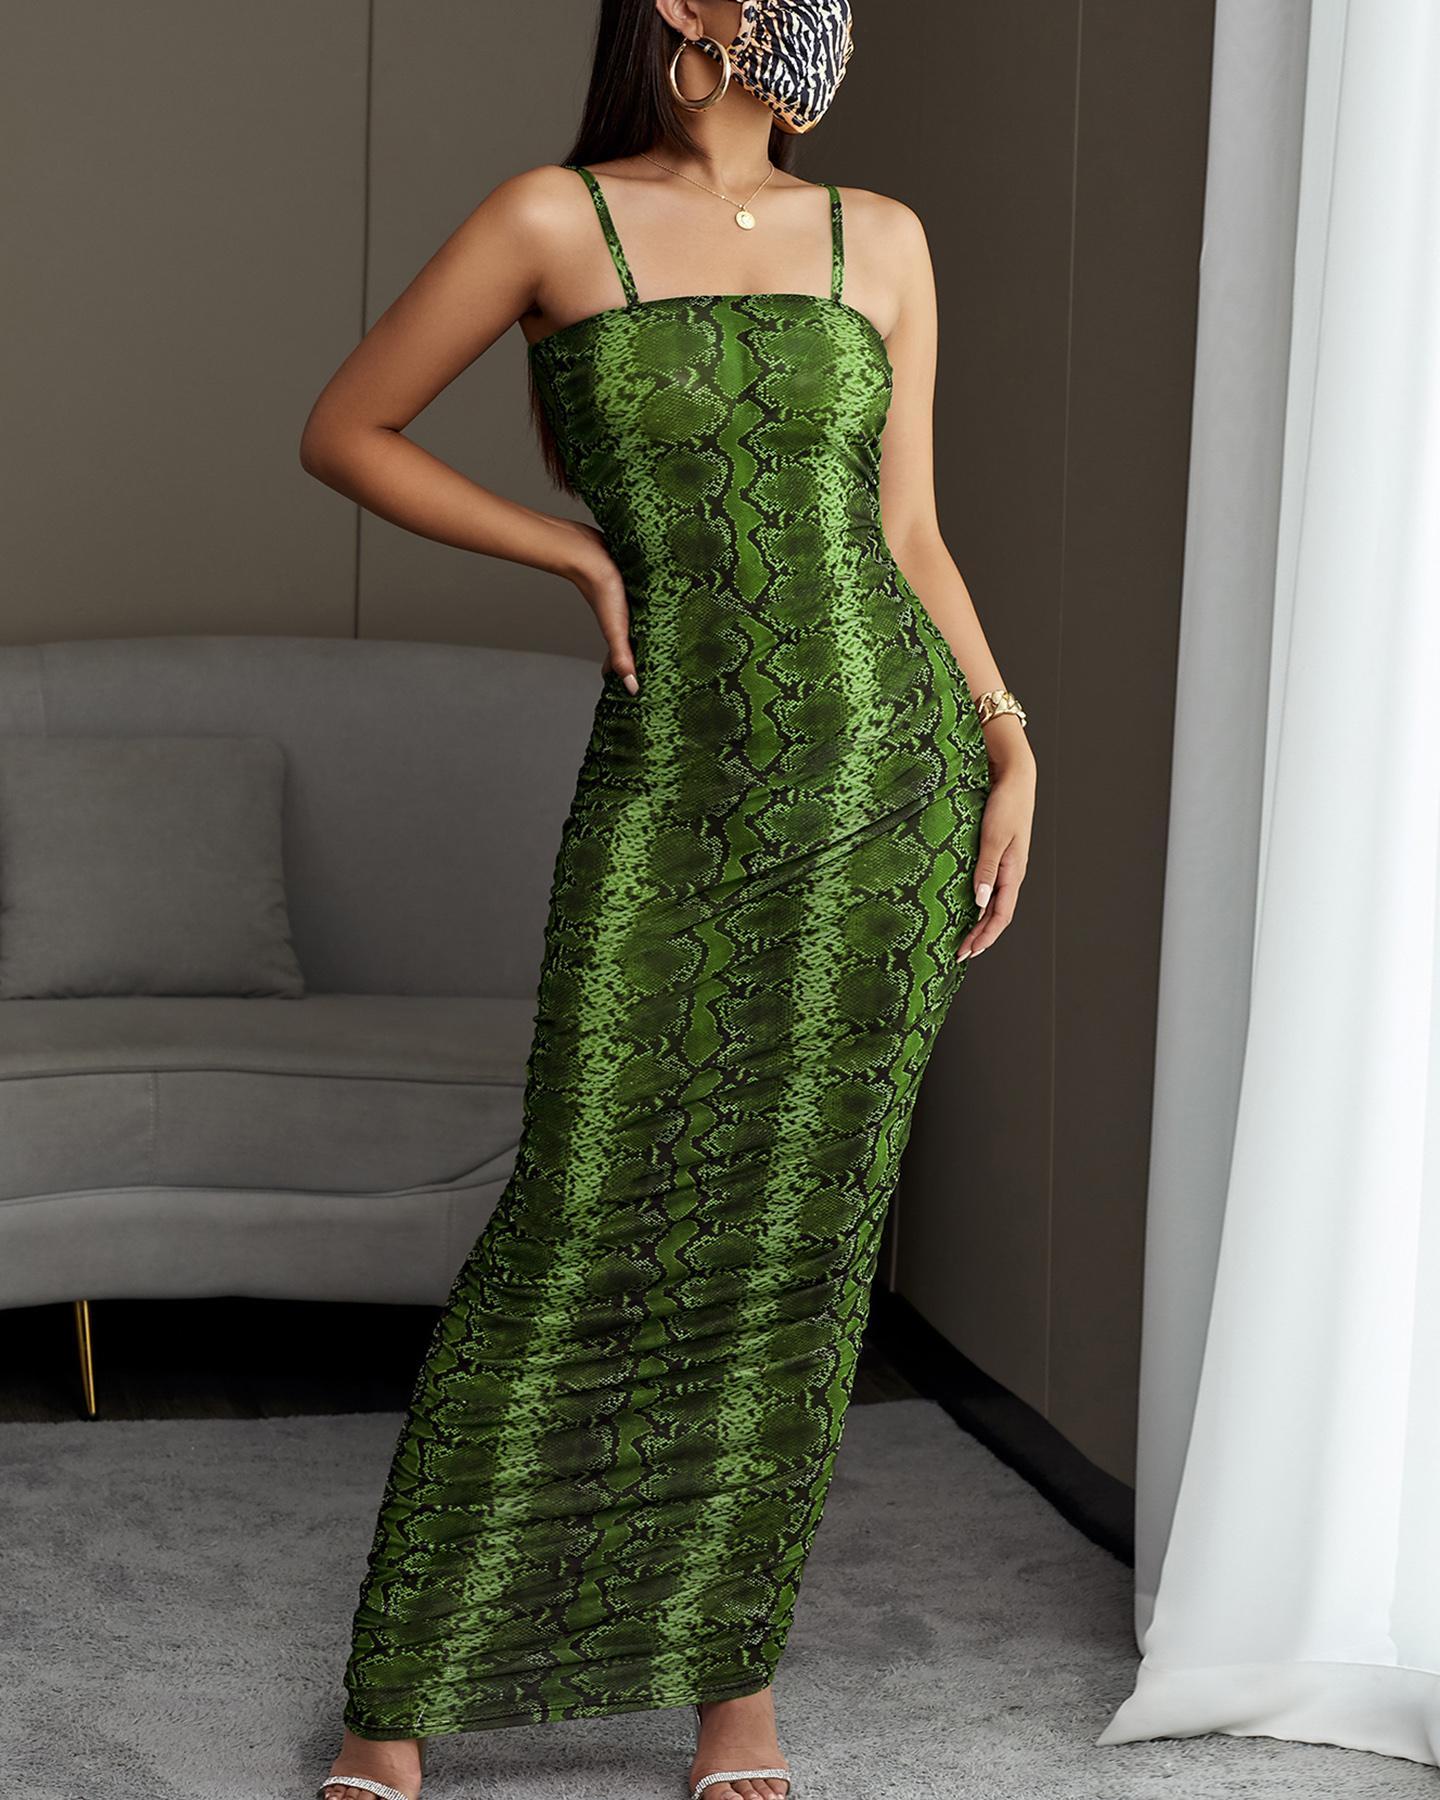 Snakeskin Print Spaghetti Strap Dress фото